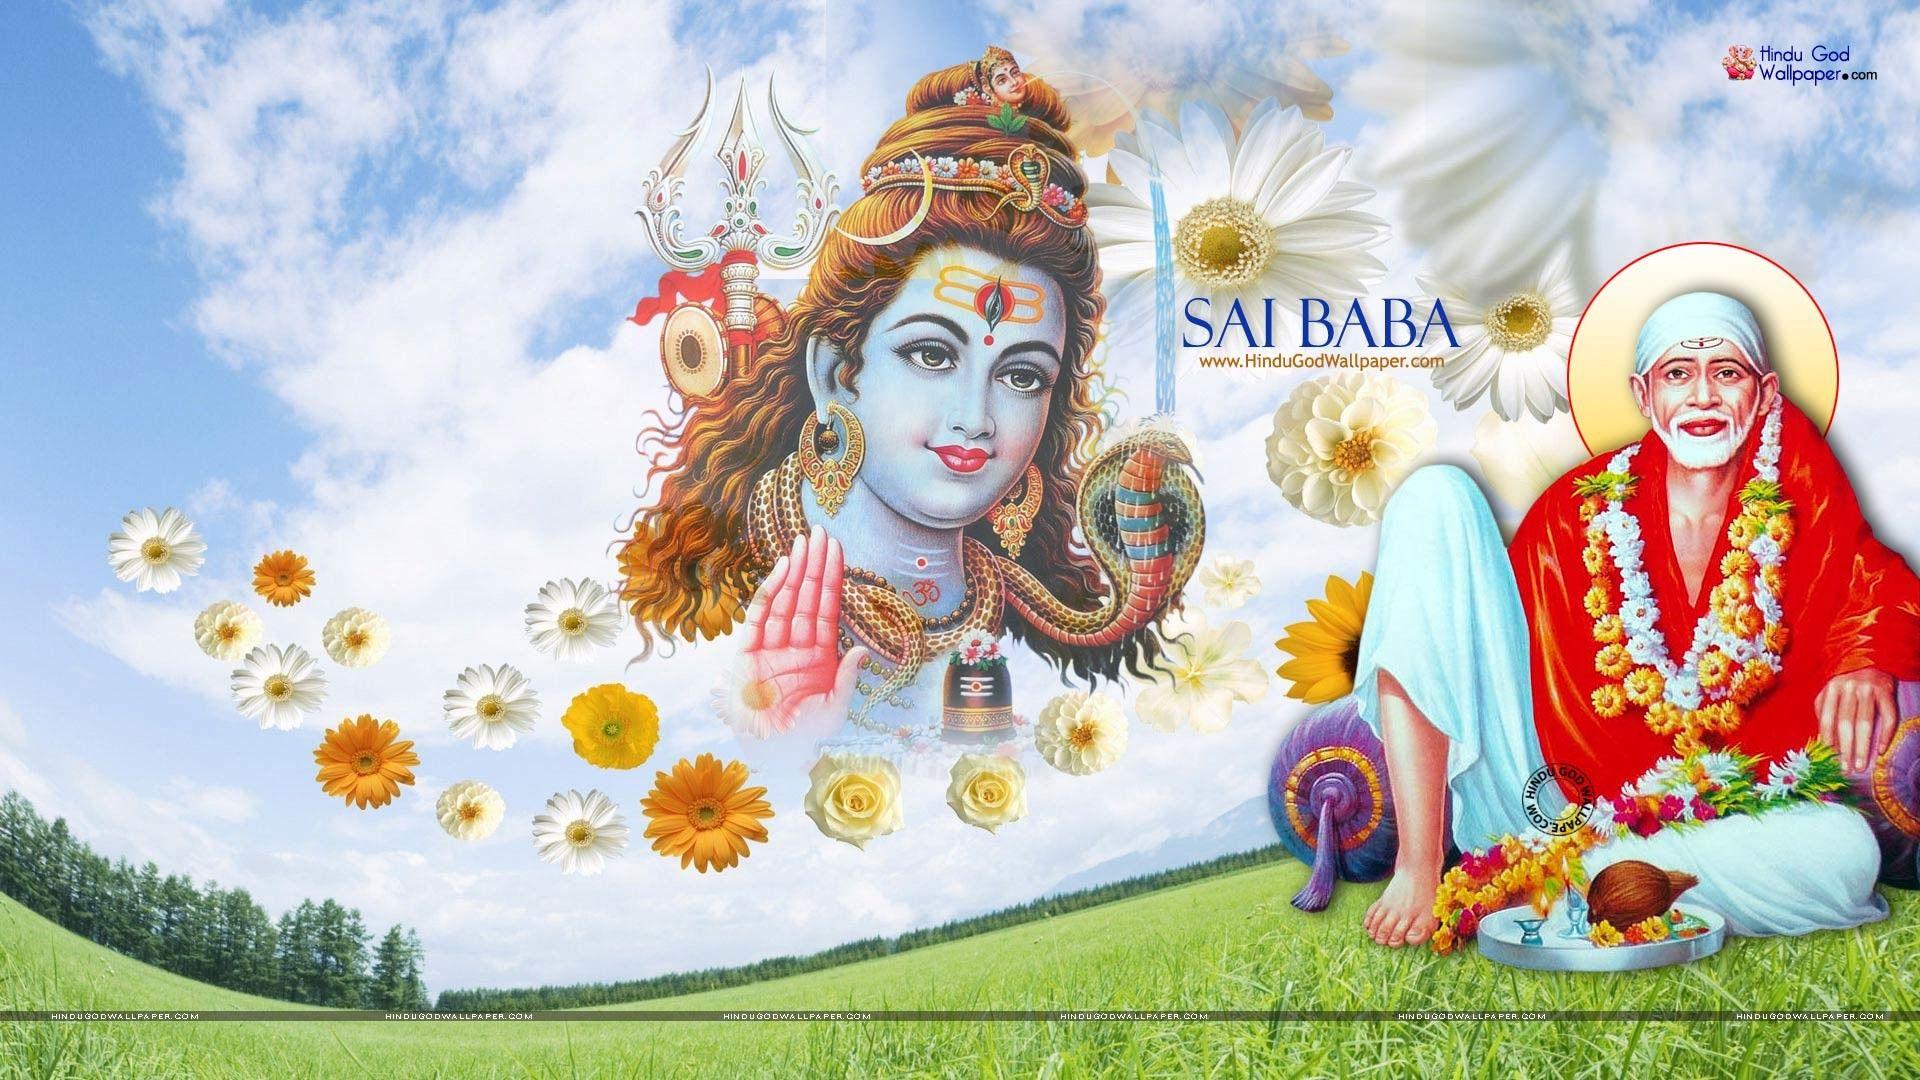 1920x1080 Download Sai Baba Wallpapers Sai Baba Wallpapers Sai Wallpaper Shirdi Sai Baba Sai Baba Hd Wallpaper Hd Wallpapers 1080p Maa Durga Hd Wallpaper